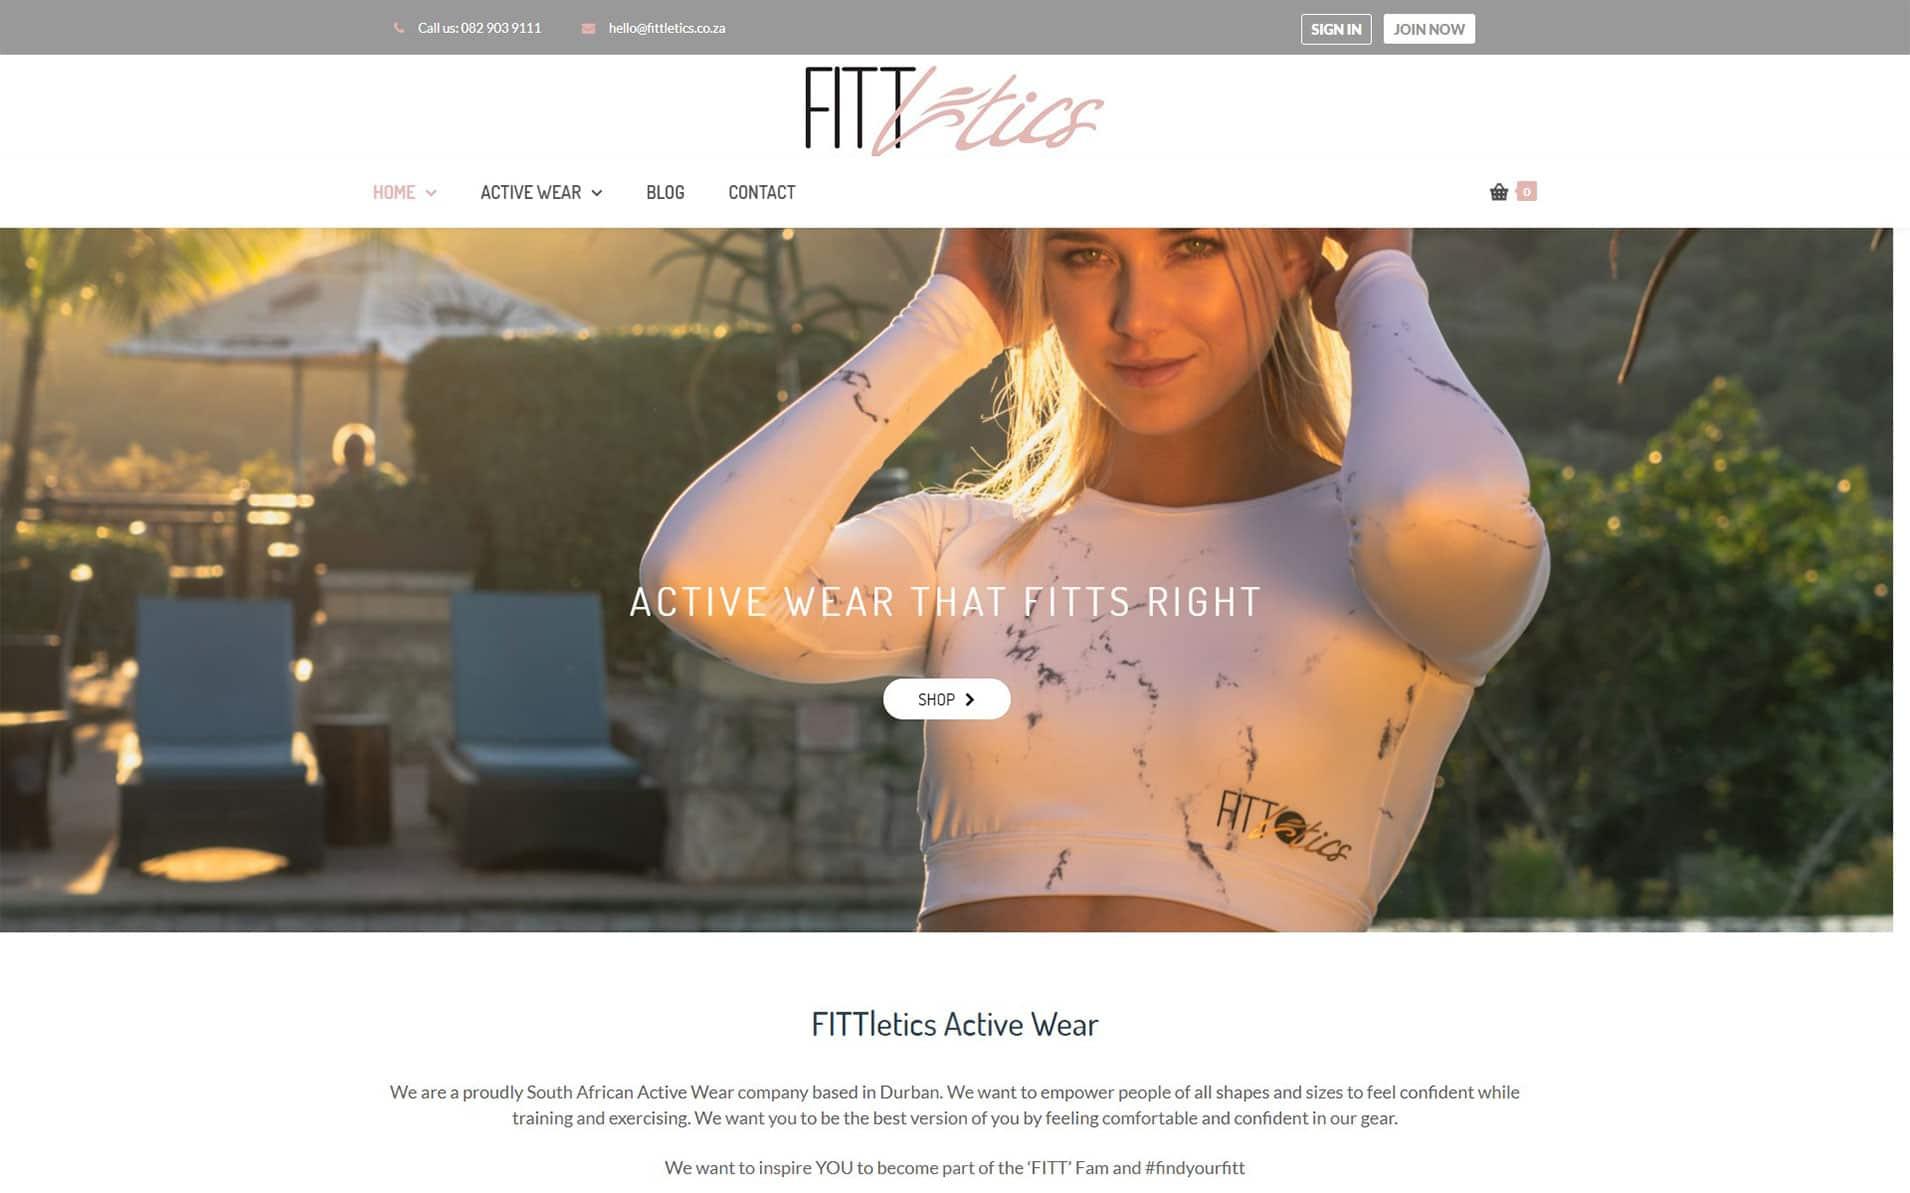 Fittletics active wear